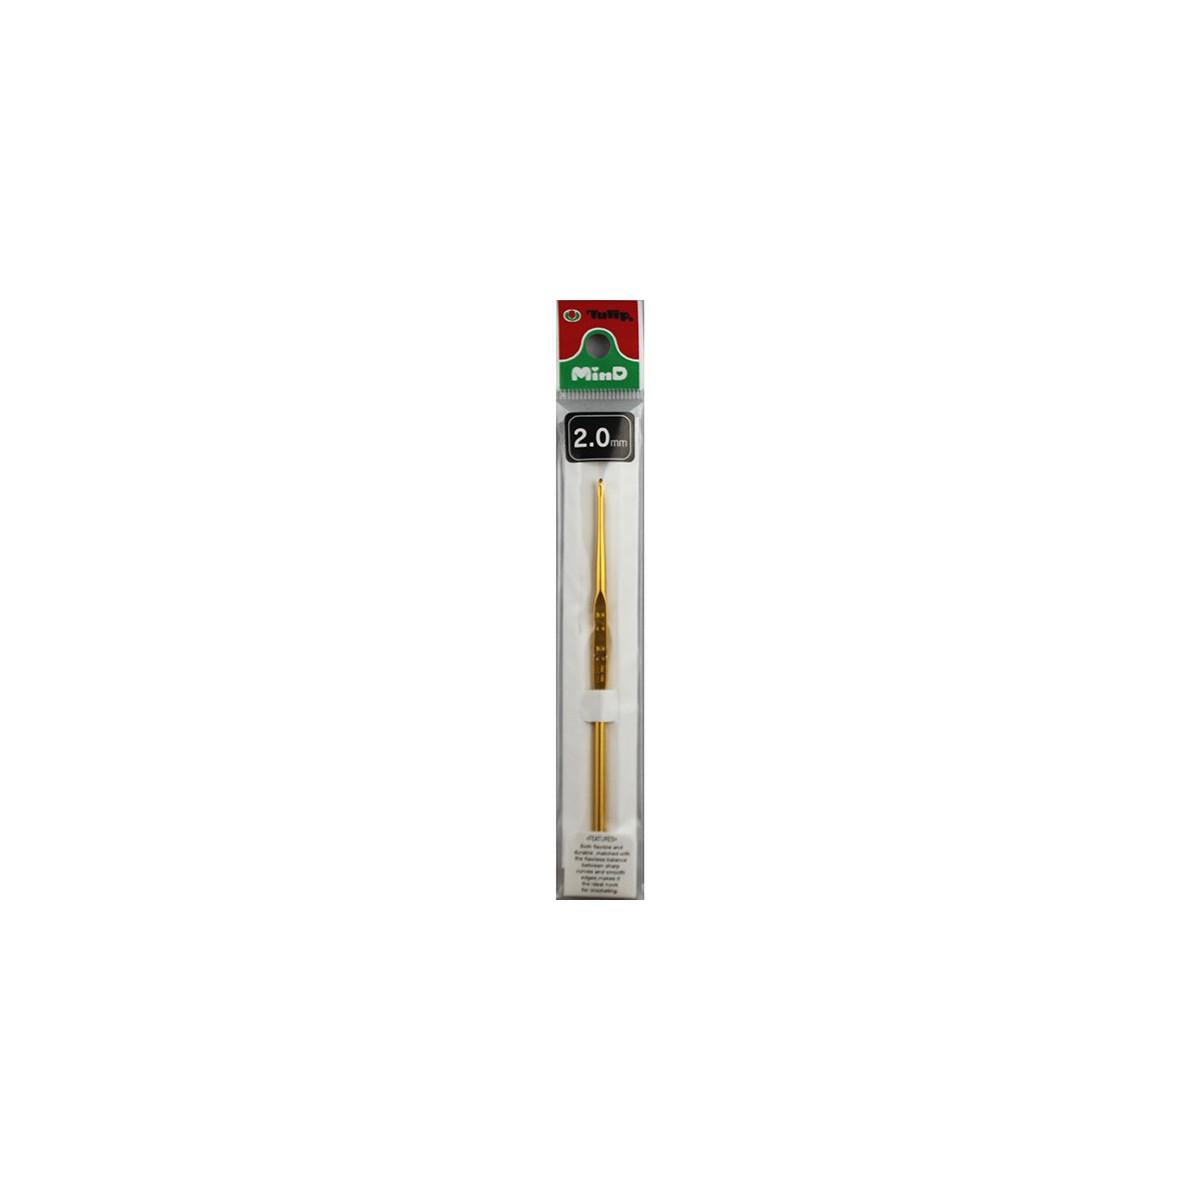 Uncinetto Tulip 2,00mm - 2/0